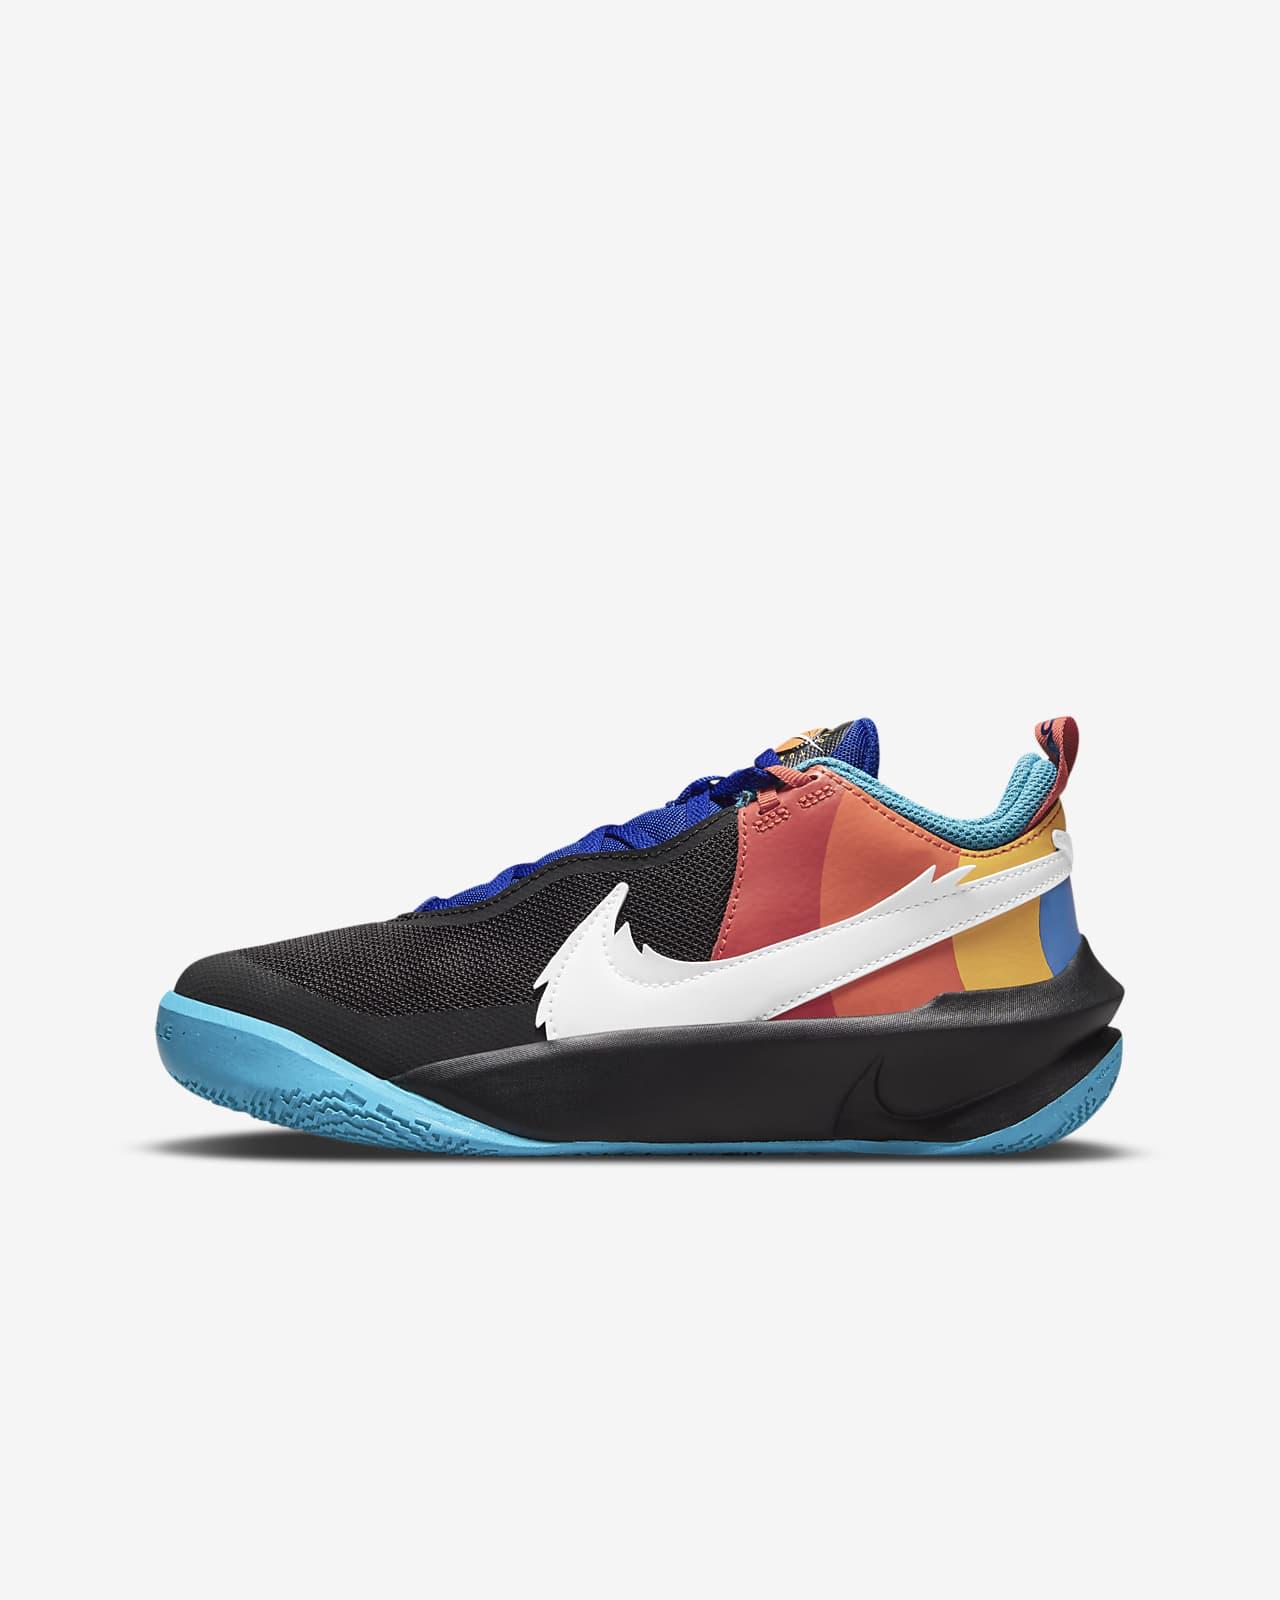 Nike Team Hustle D 10 SE x Space Jam: A New Legacy Big Kids' Basketball Shoes